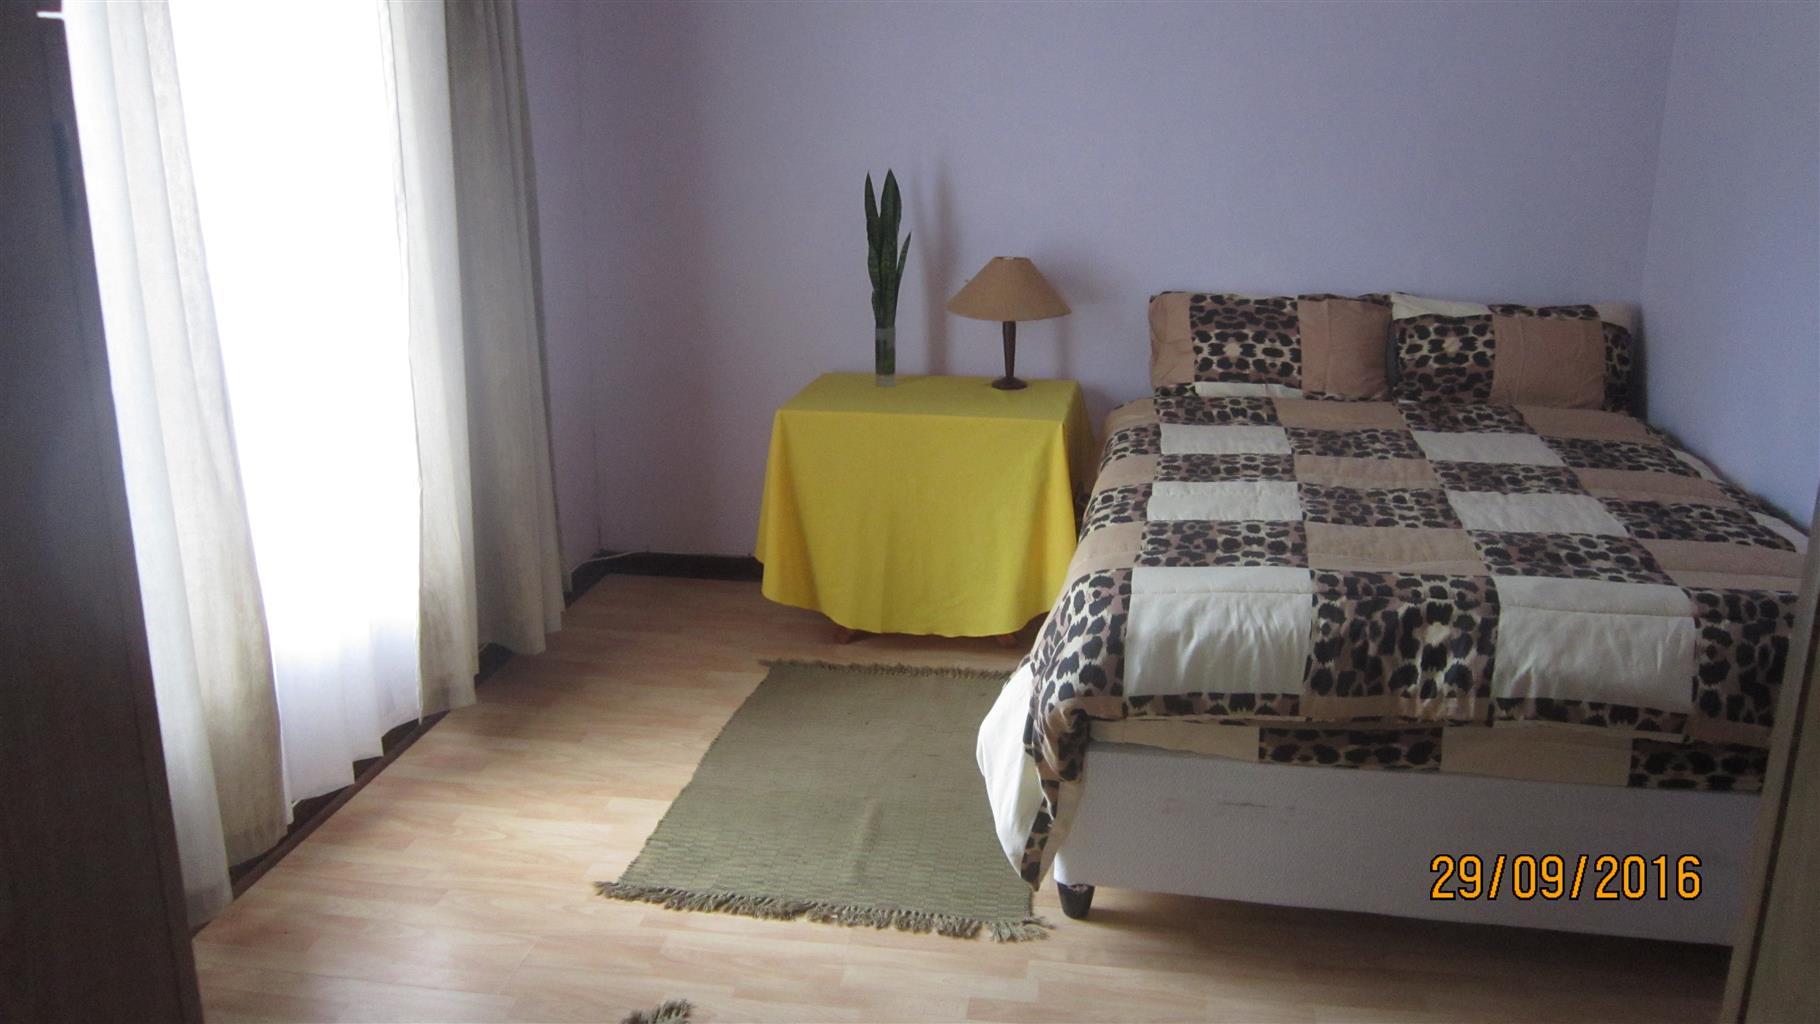 Furnished room for rent to single gentleman in Glenhaven Estate, Bellville South.